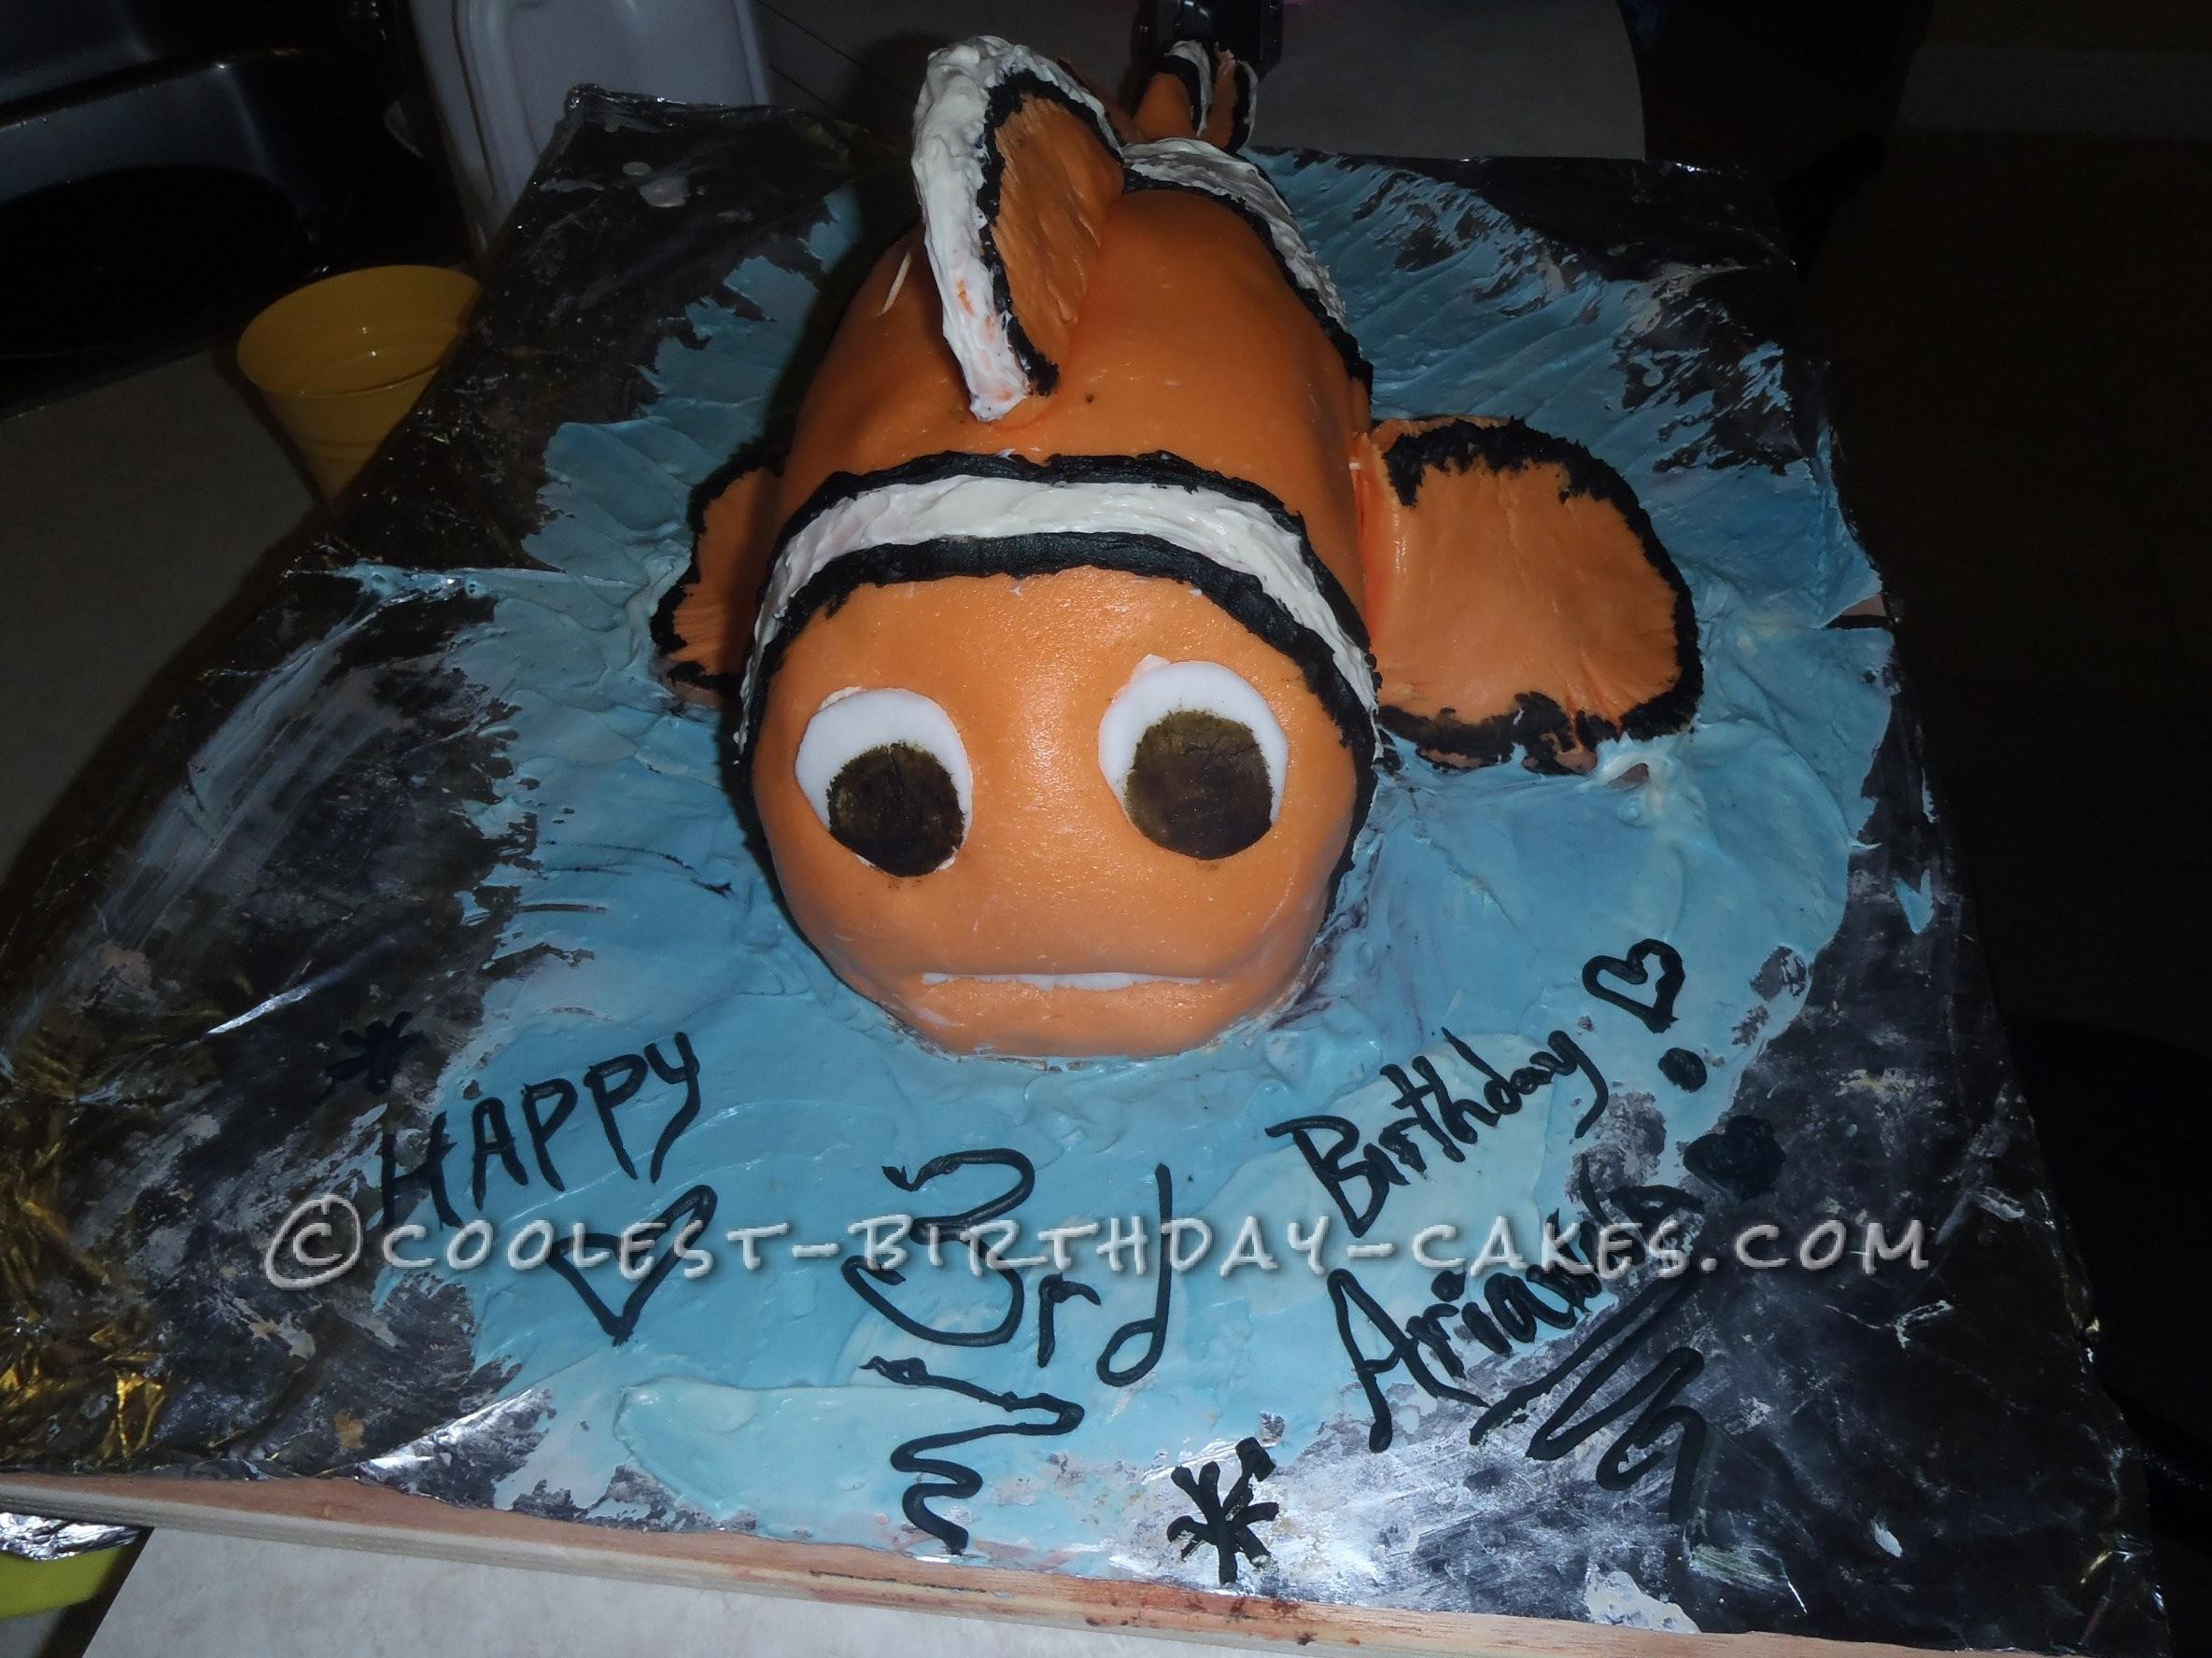 cake 3D Nemo cake i did 10 layers